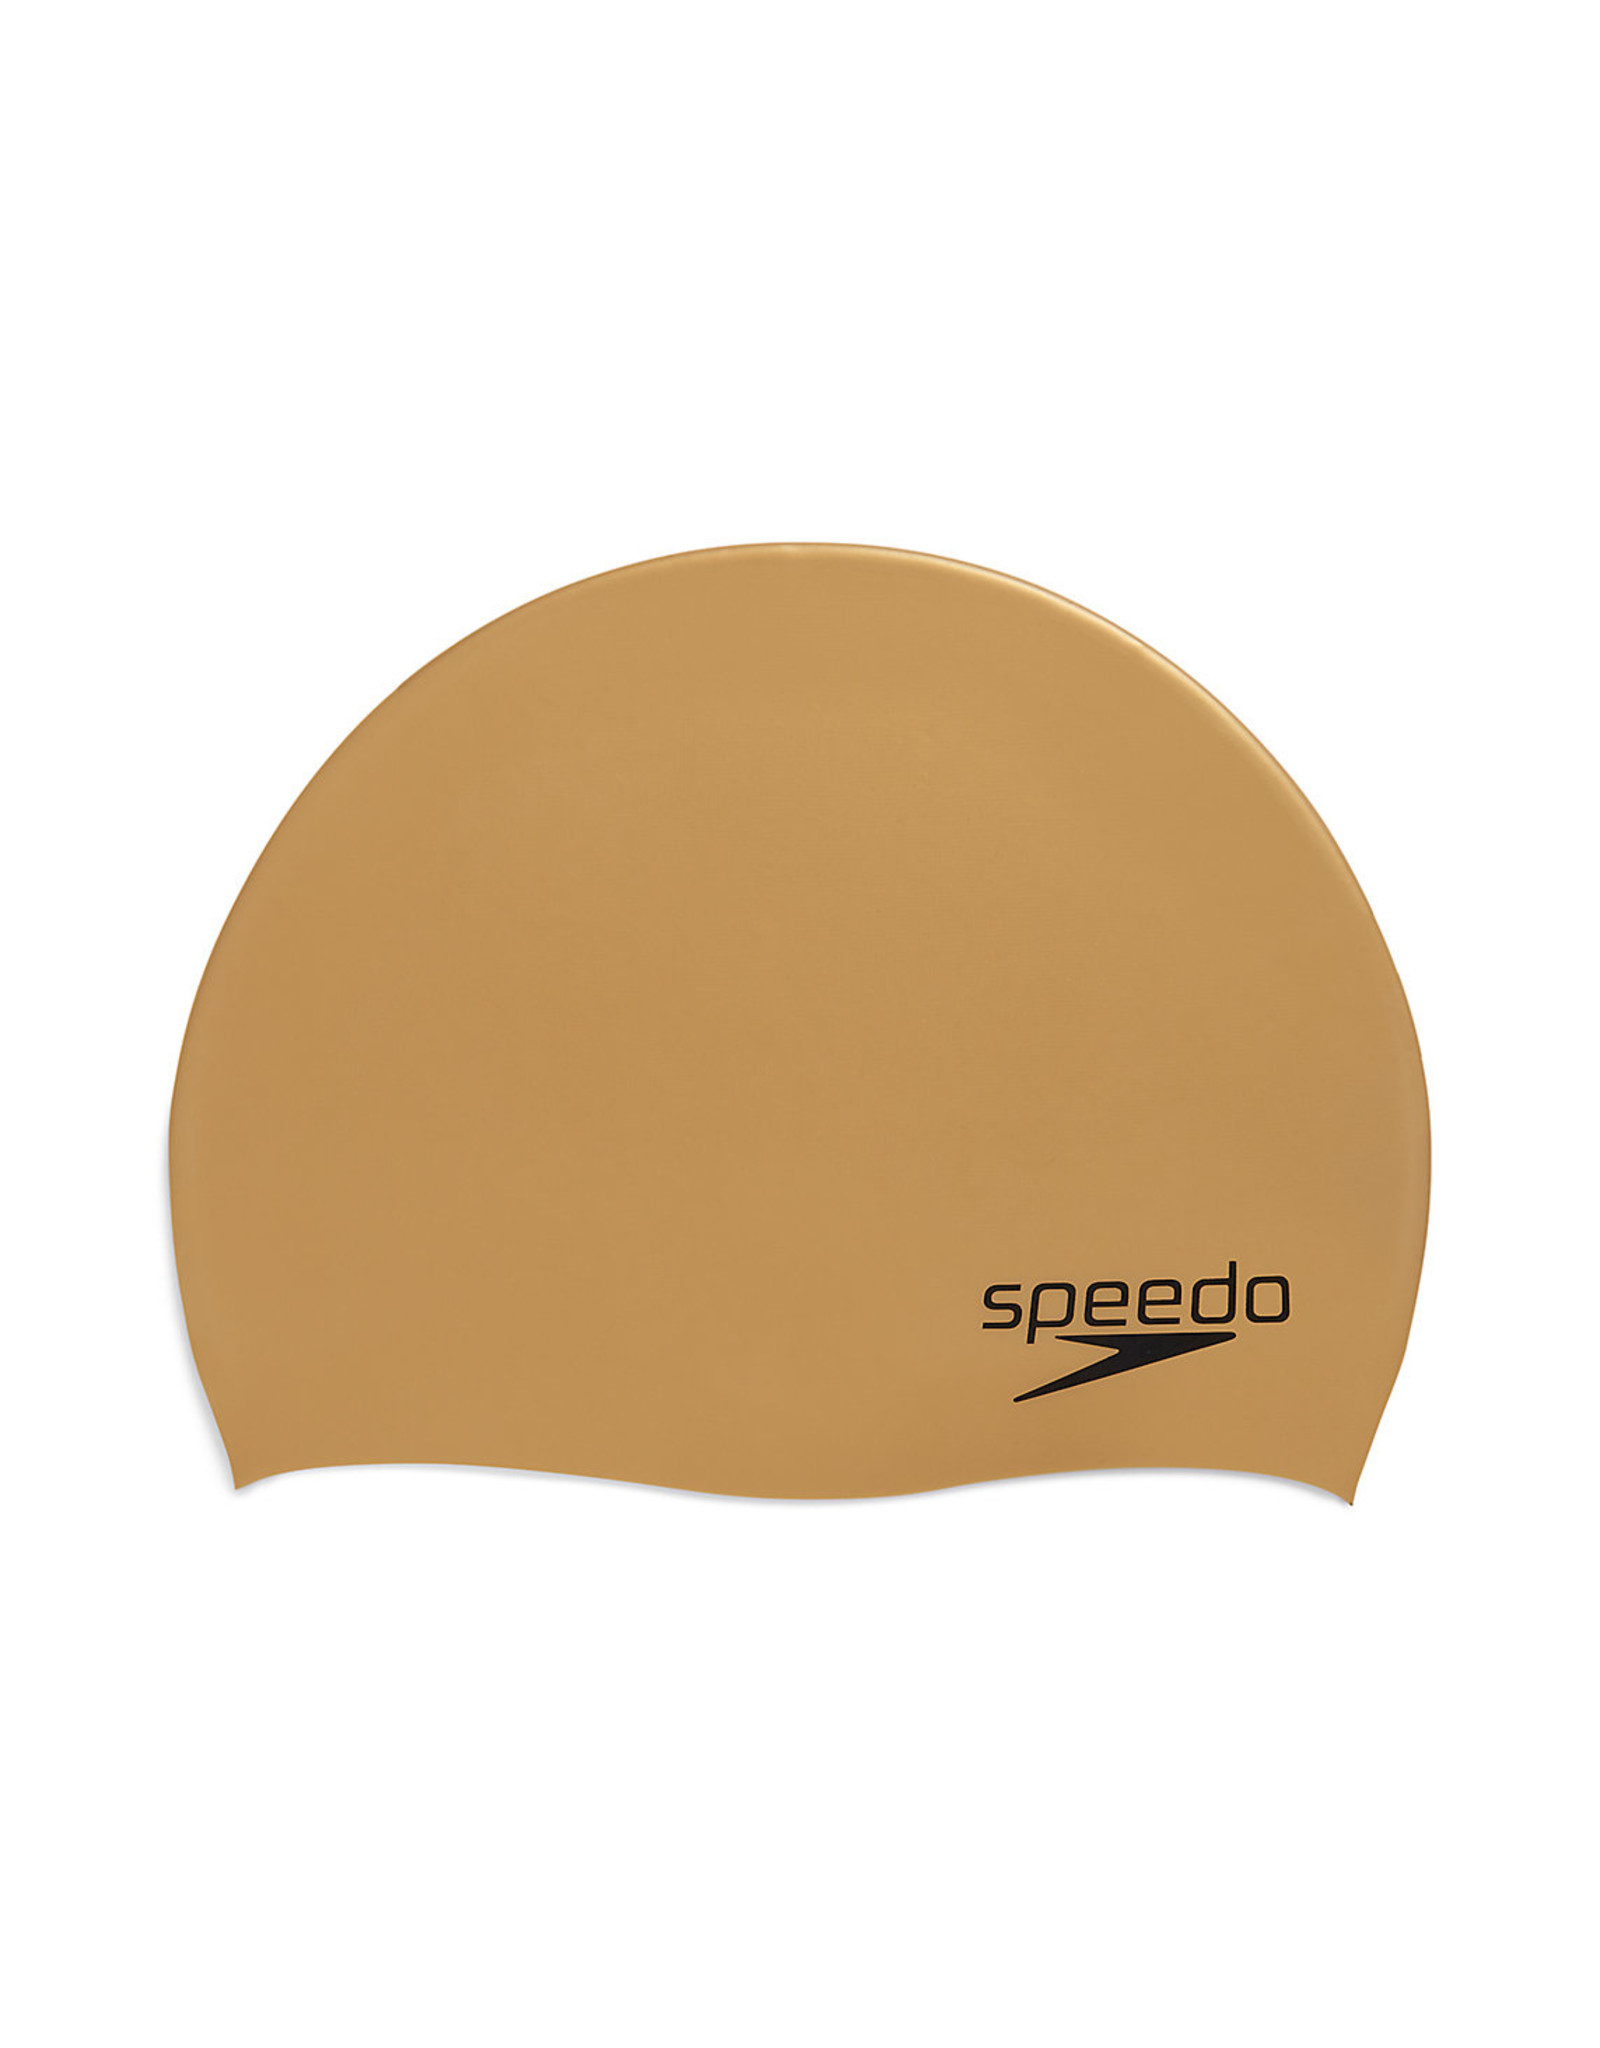 SPEEDO SPEEDO ELASTOMERIC SOLID SILICONE CAP